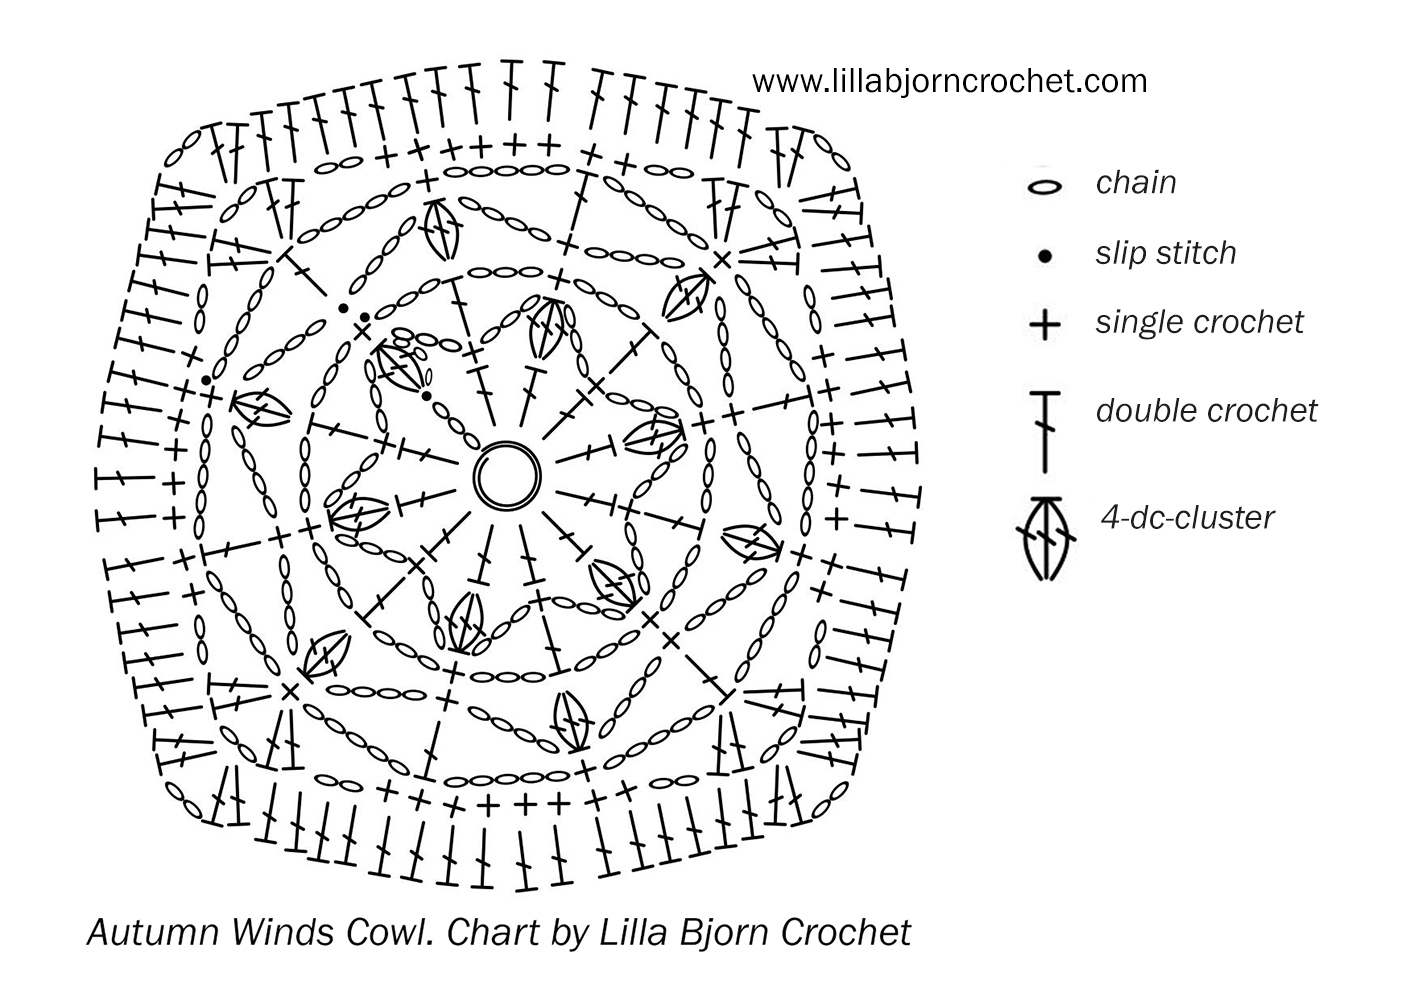 Autumn winds cowl free crochet pattern lillabjrns crochet world free crochet pattern by lilla bjorn crochet ccuart Gallery